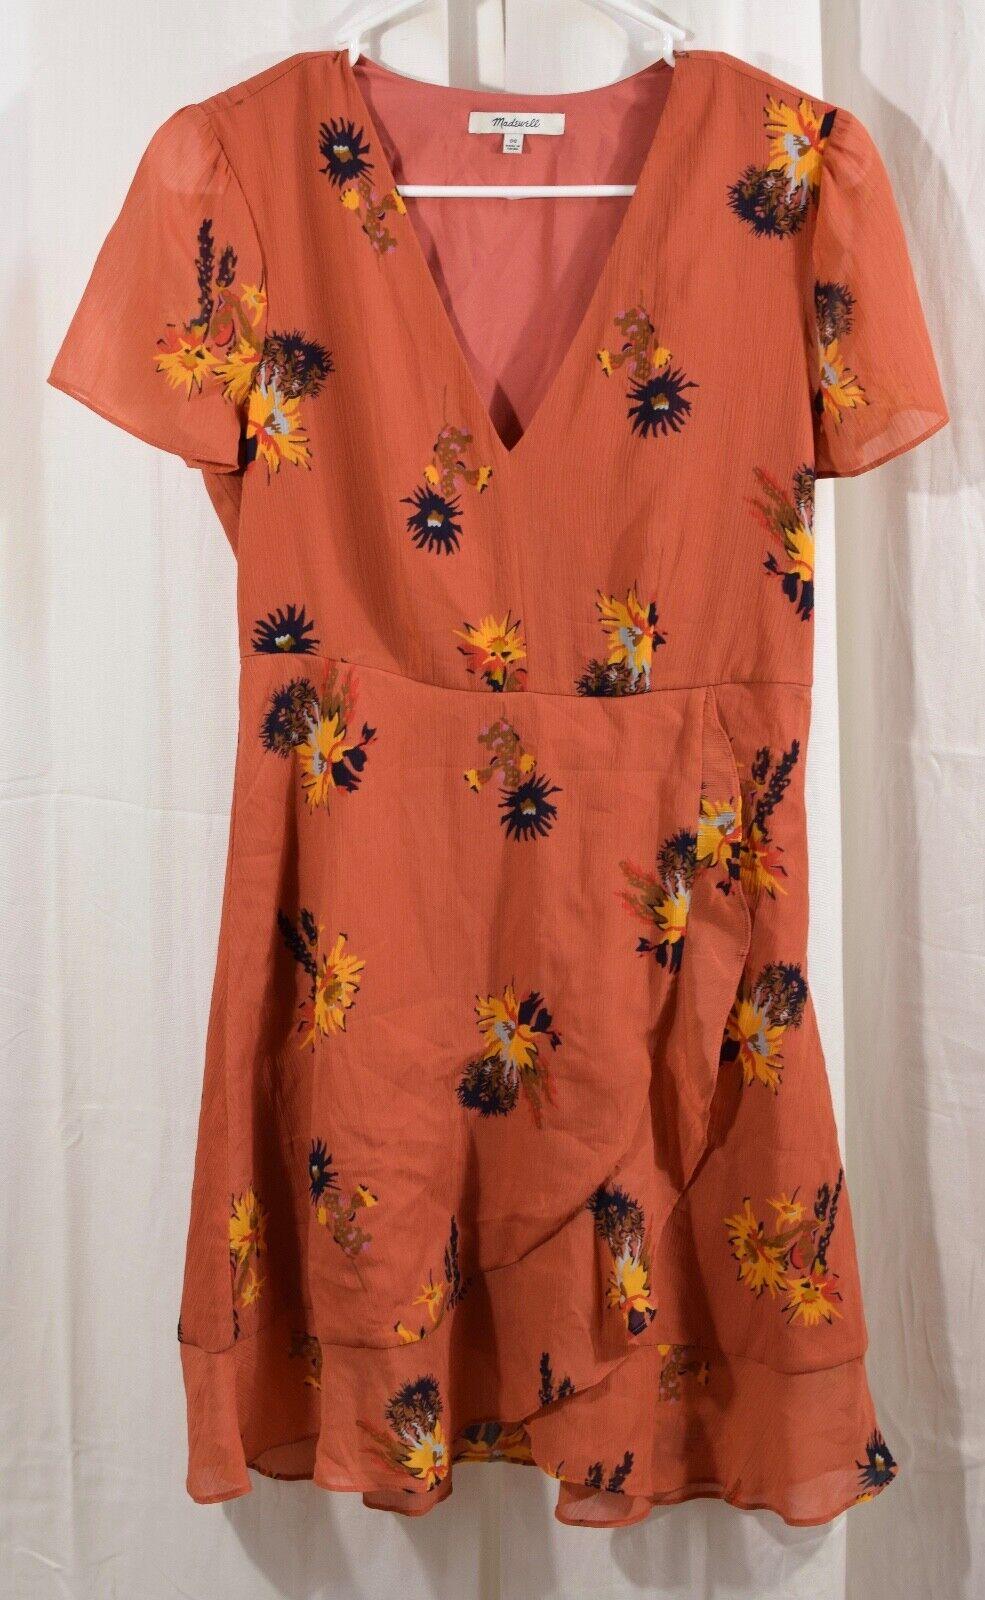 Madewell Posy Cactus Flower Dress Size 0